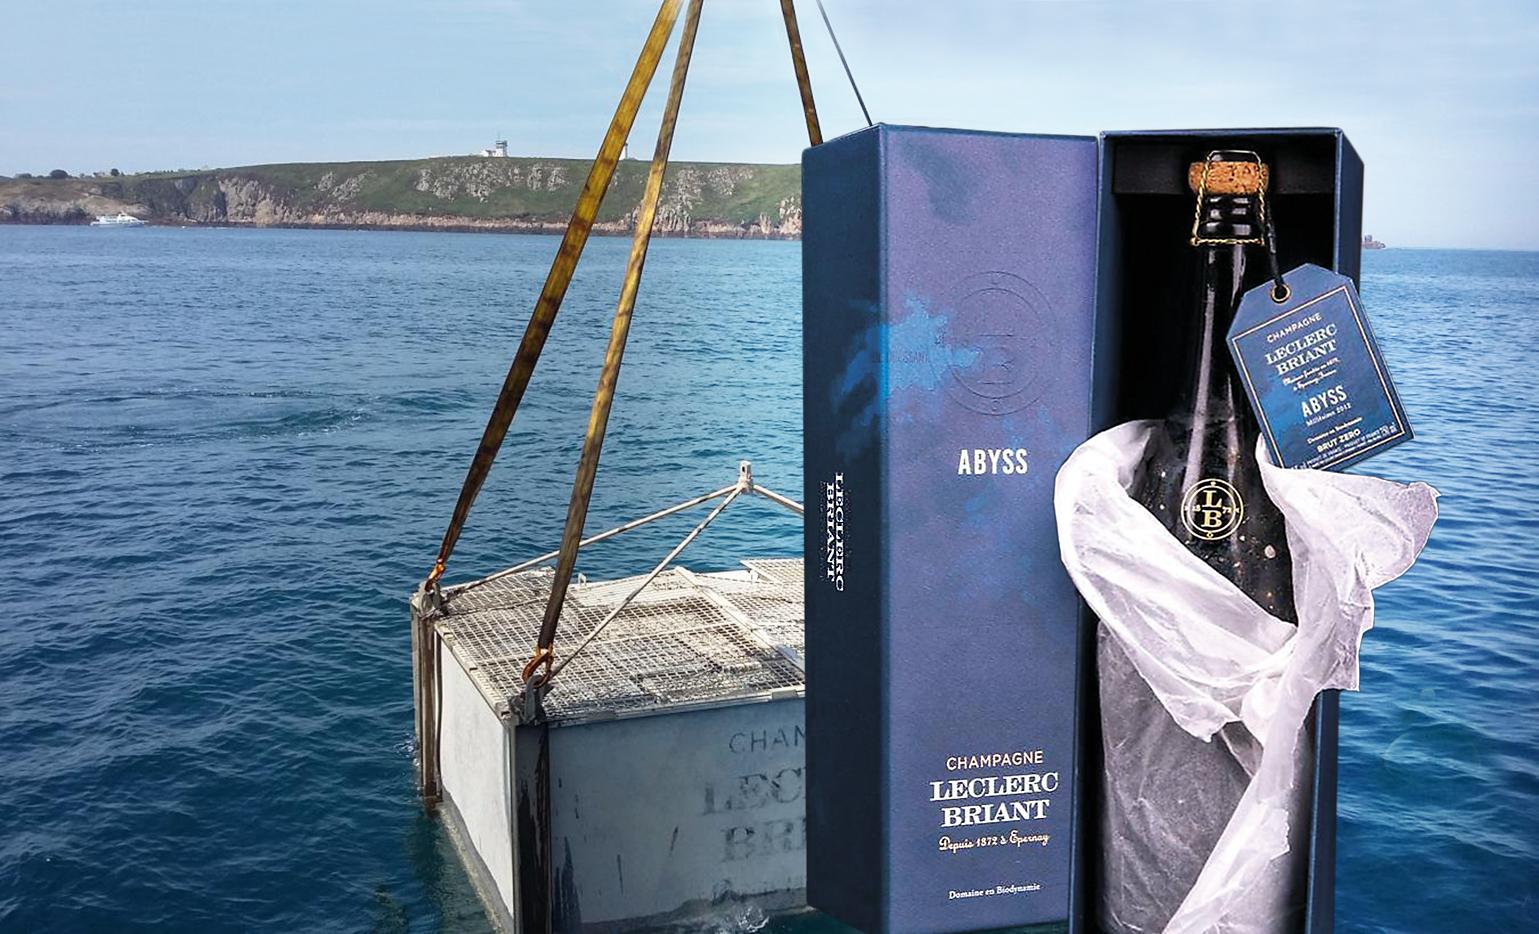 Champagner aus den Tiefen des Meeres